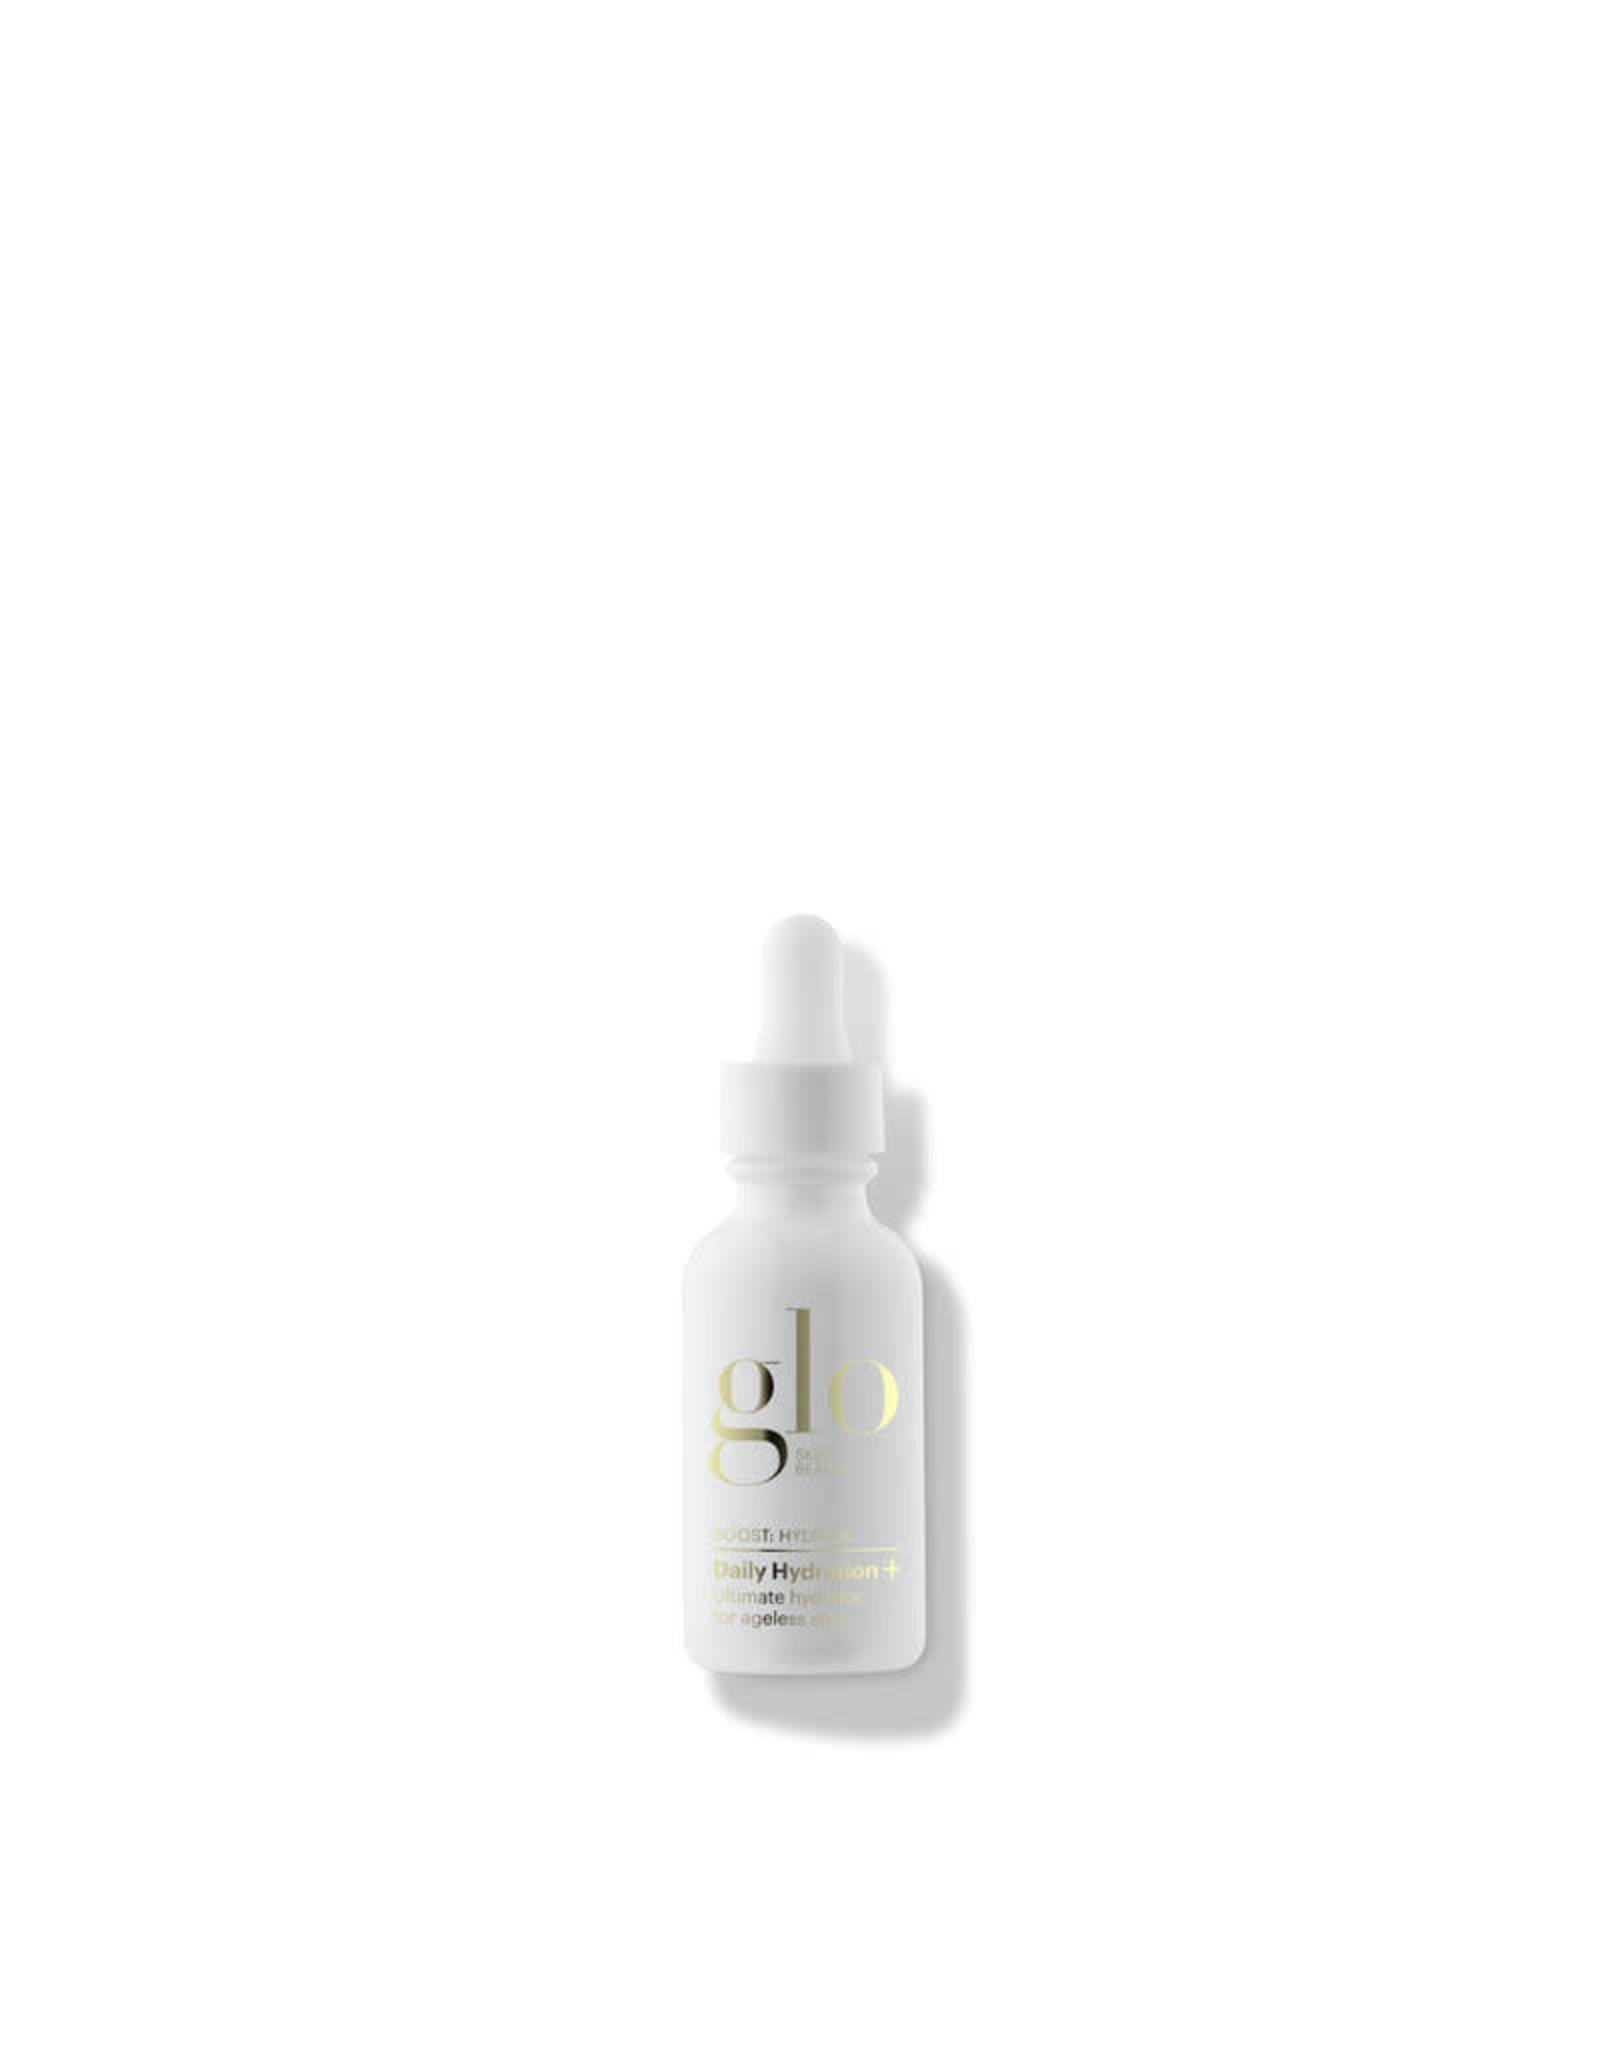 Glo Skin Beauty Daily Hydration+